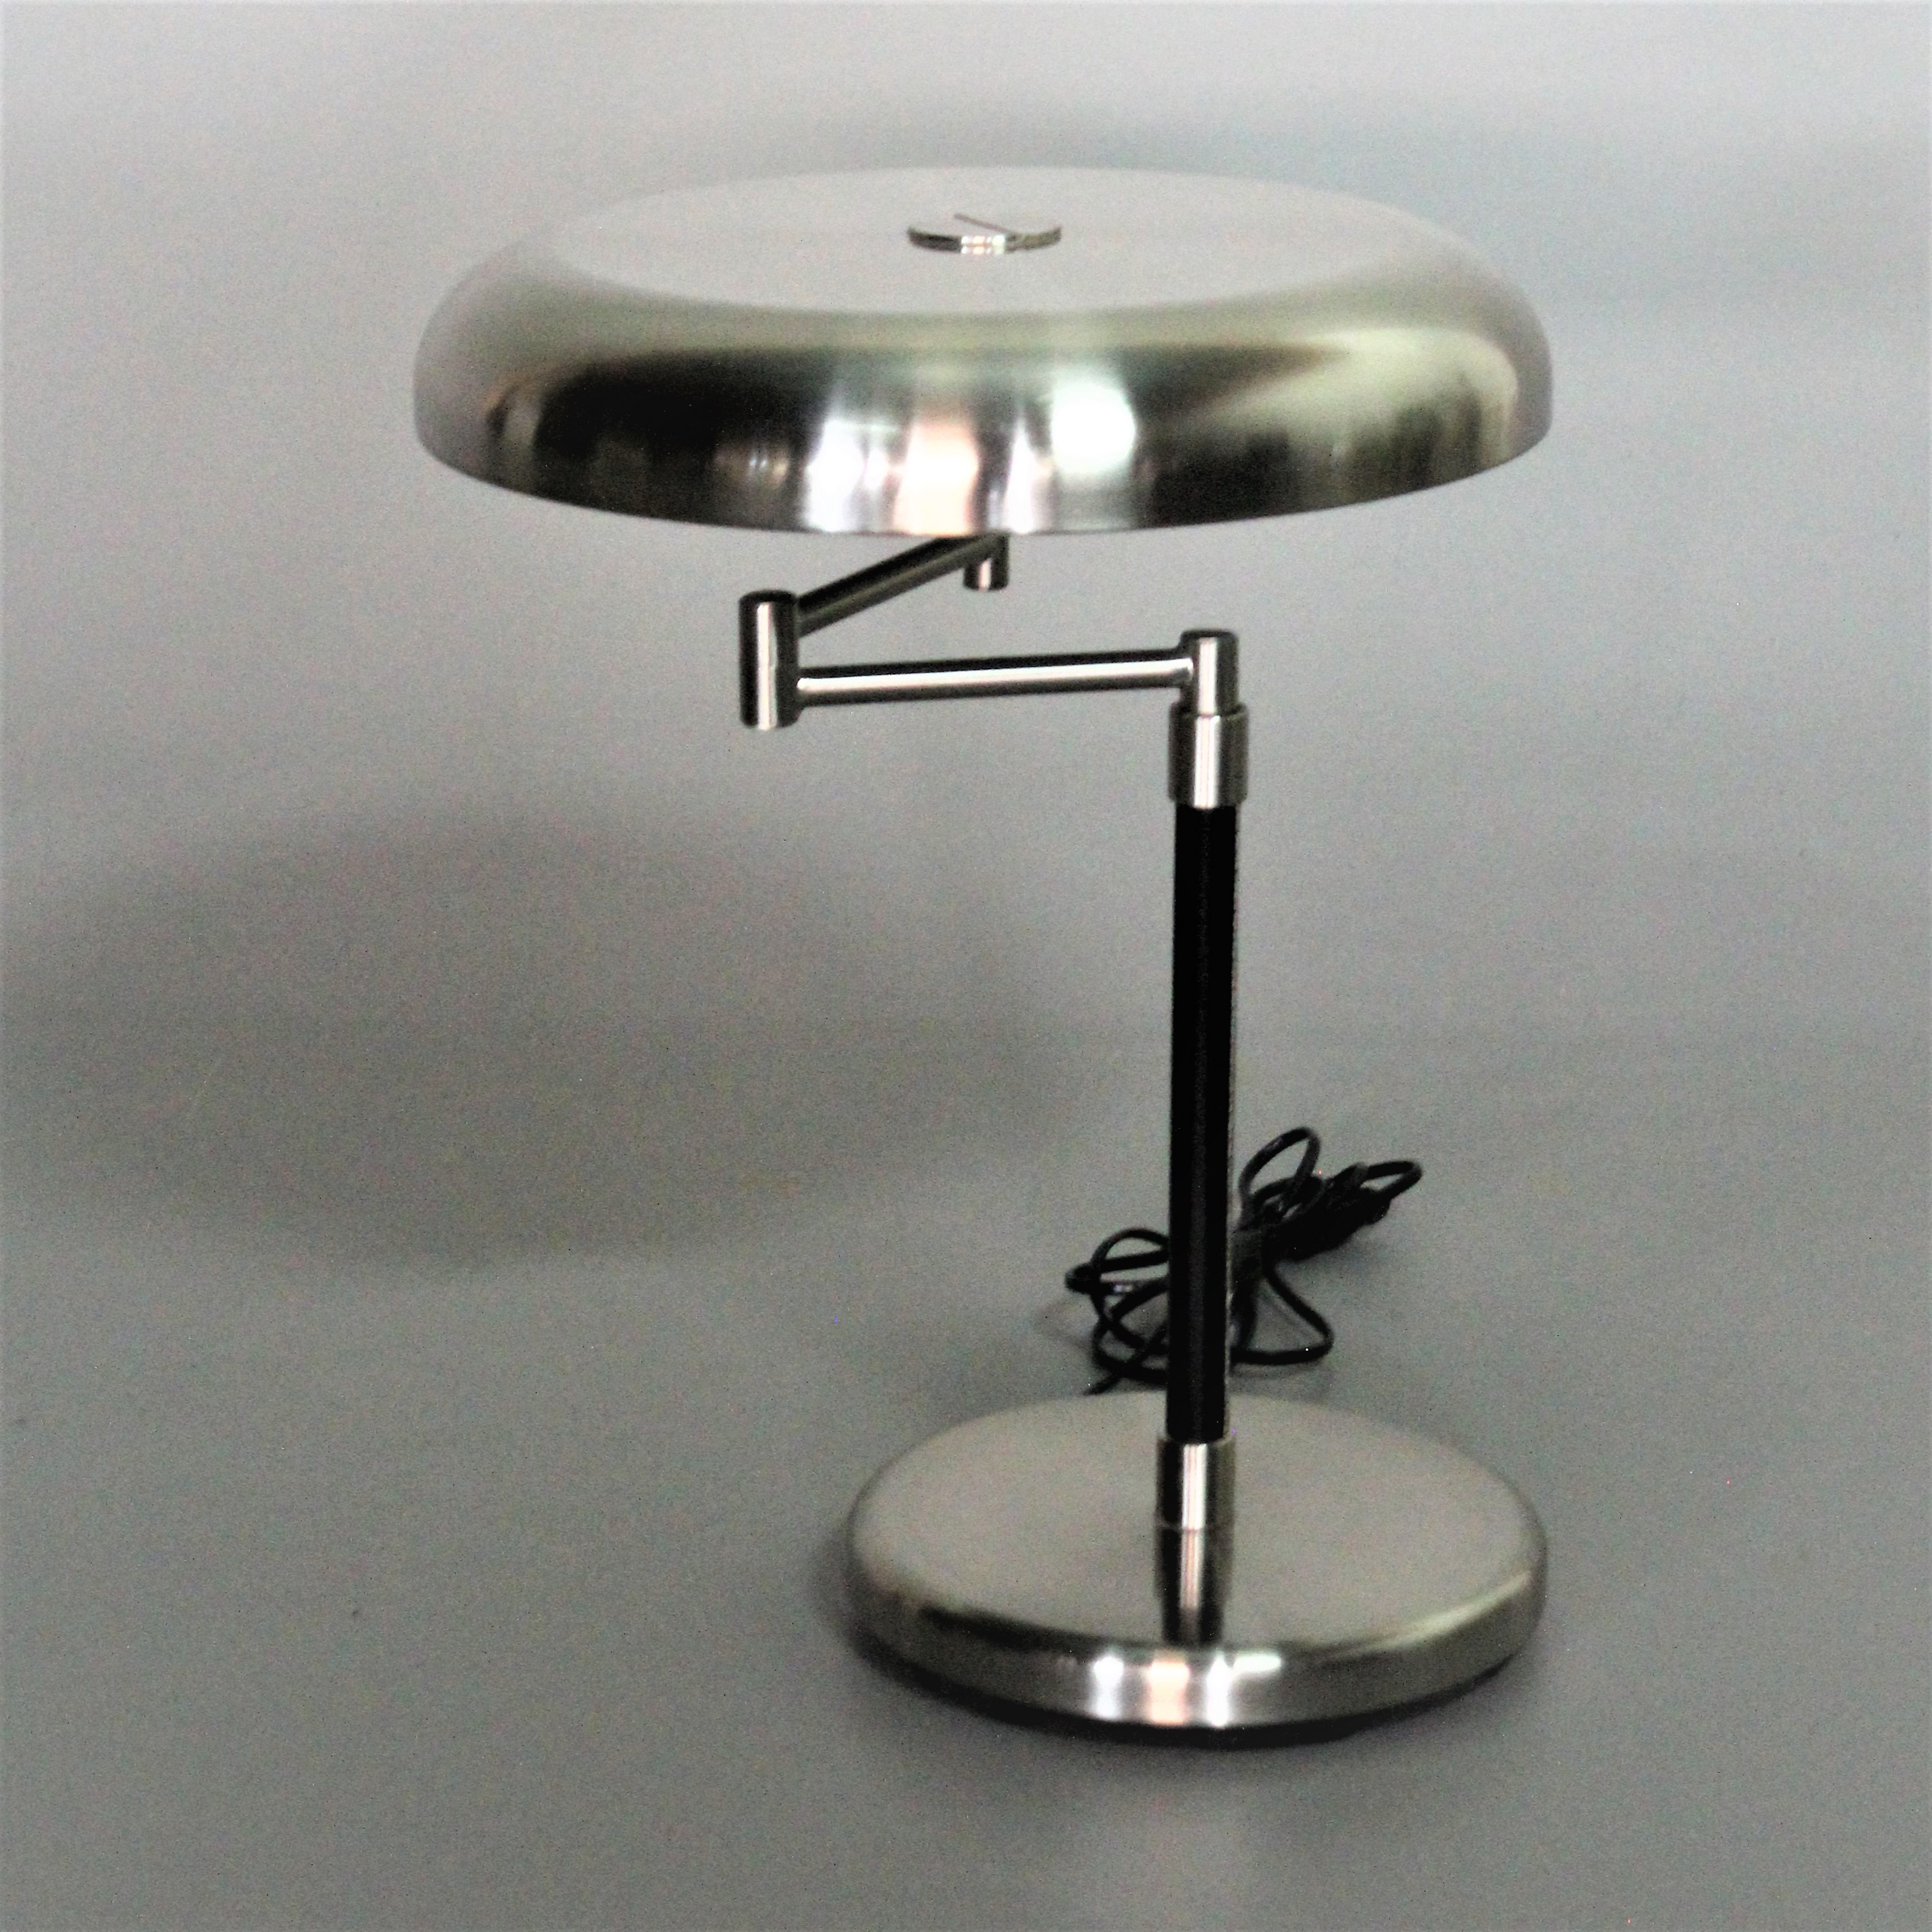 TABLE LAMP Grimsö IKEA. Lighting & Lamps Table Lamps